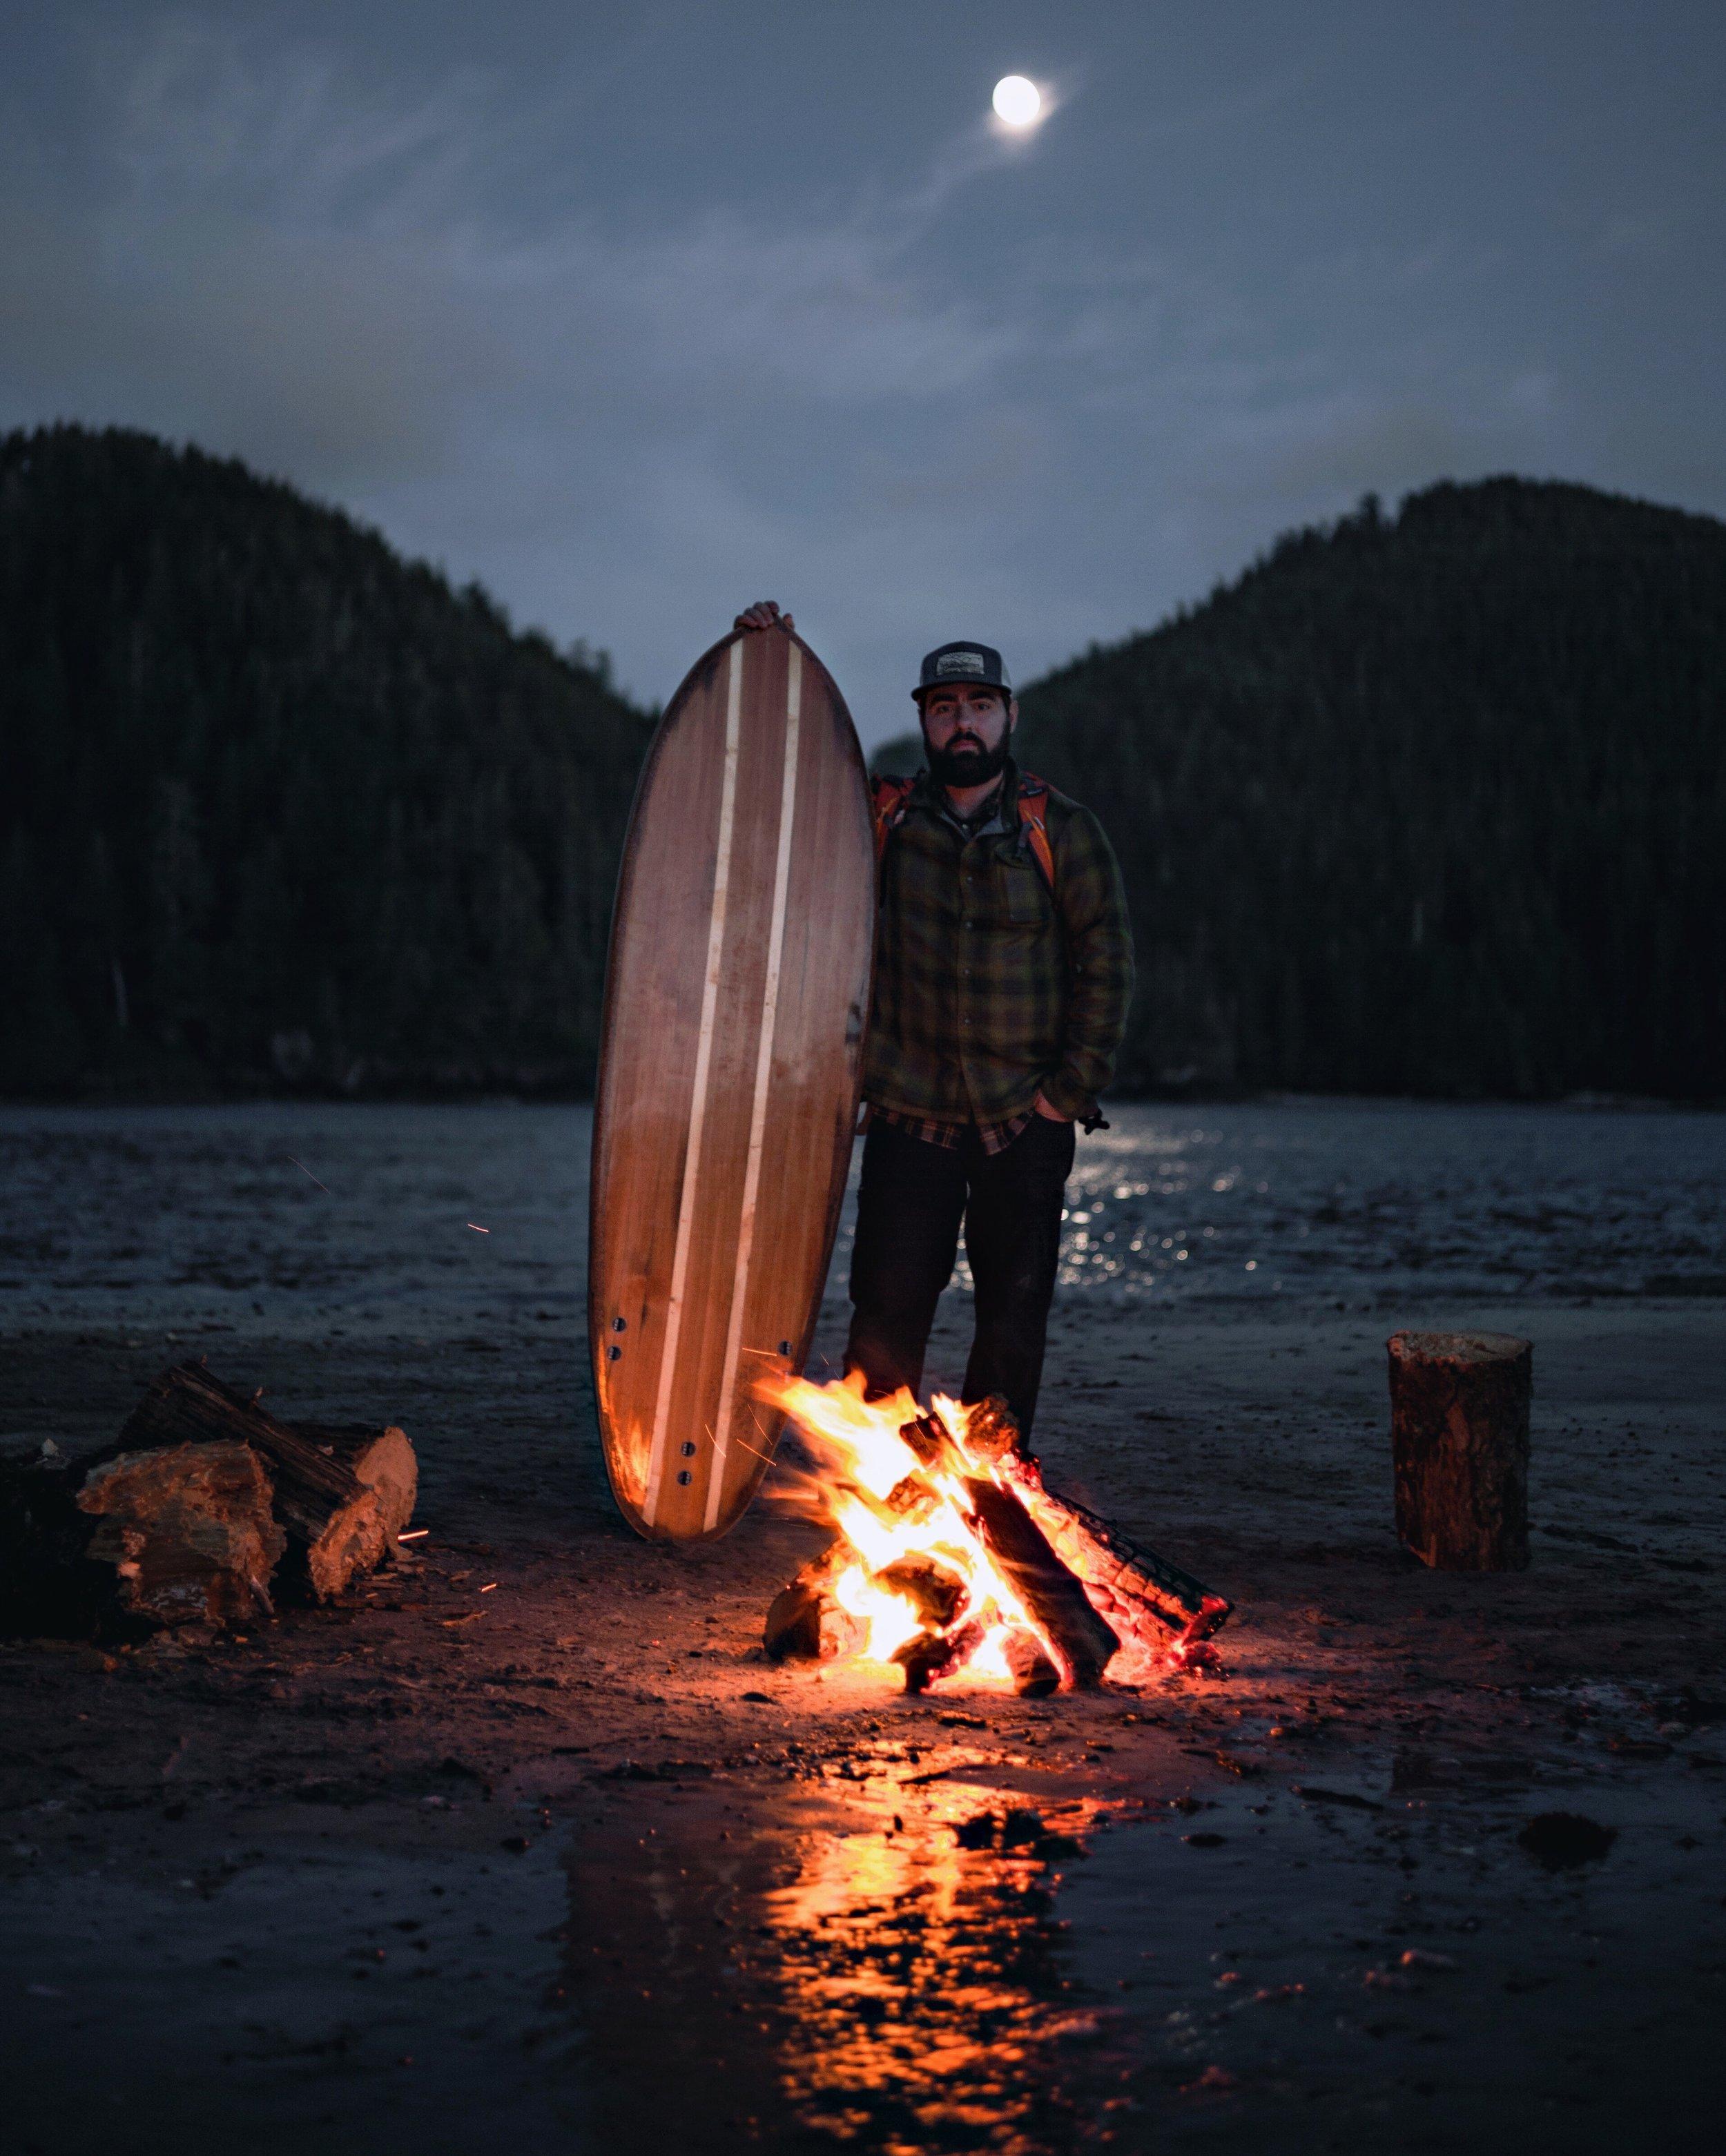 Scott Ballhorn - San Joseph Bay, Canada